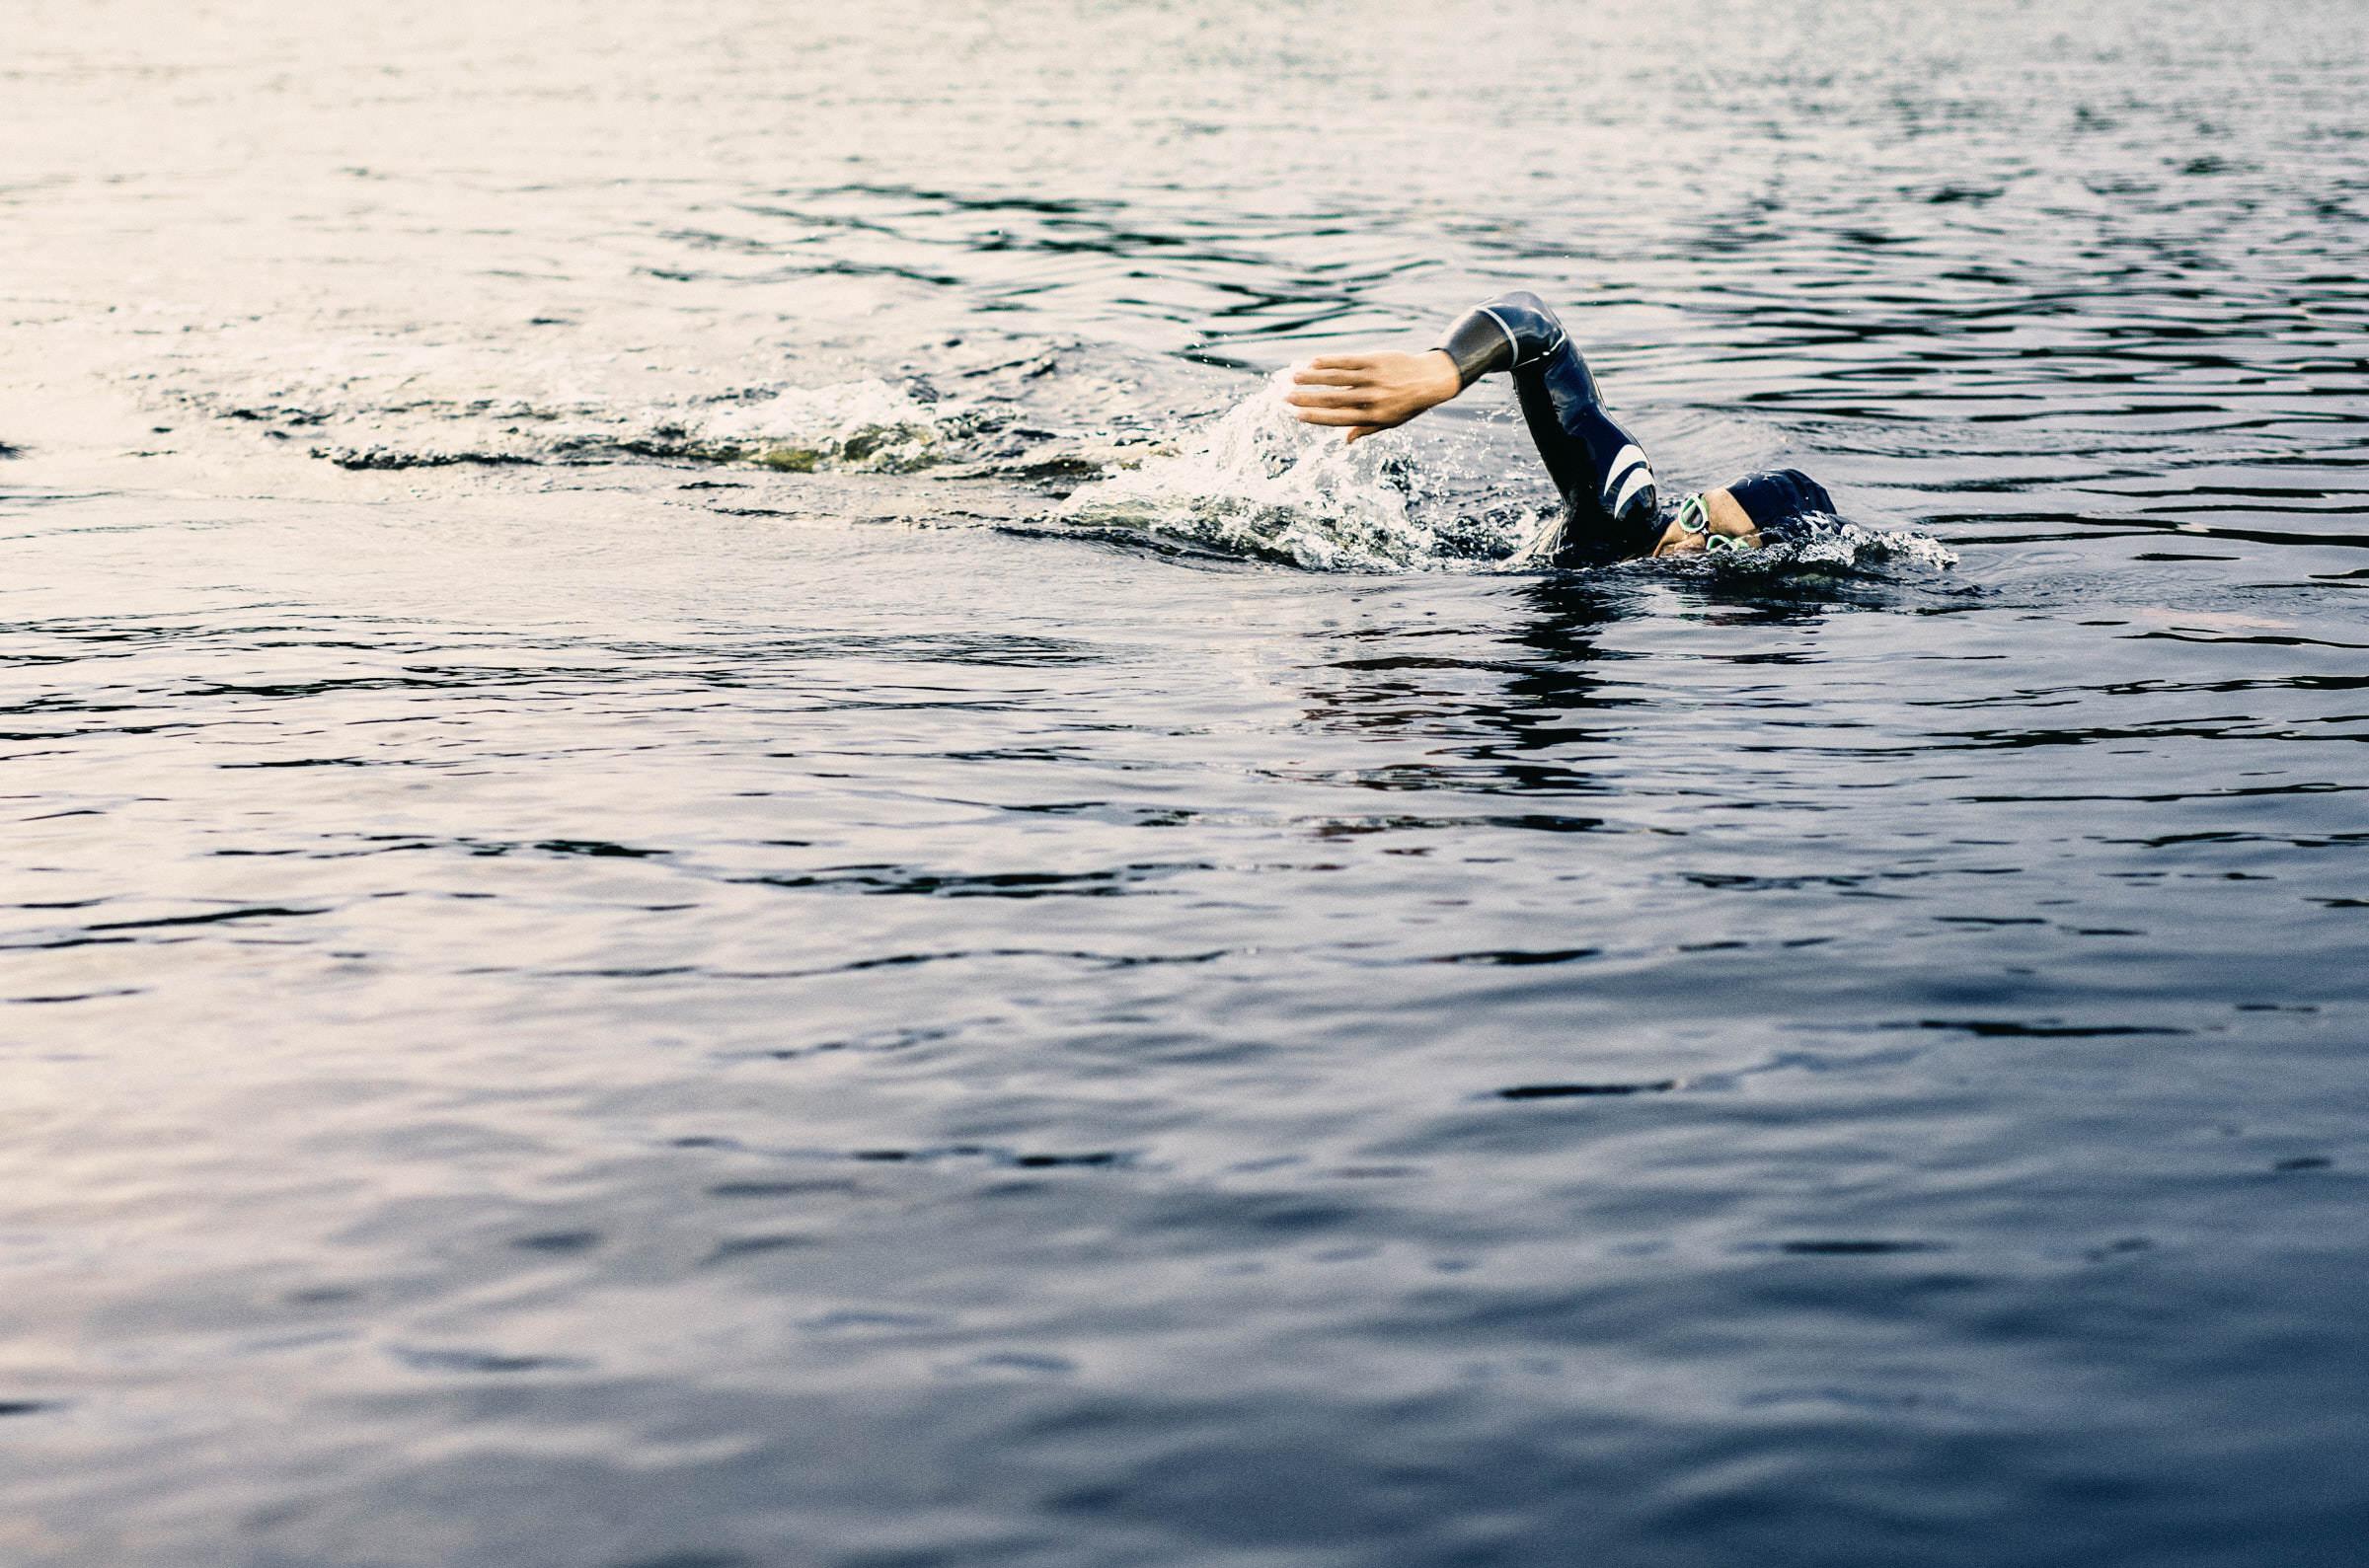 Portfolio_441_BMW_Triathlon_Dan_R026960_KRISTOFER SAMUELSSON PHOTOGRAPHY.jpg